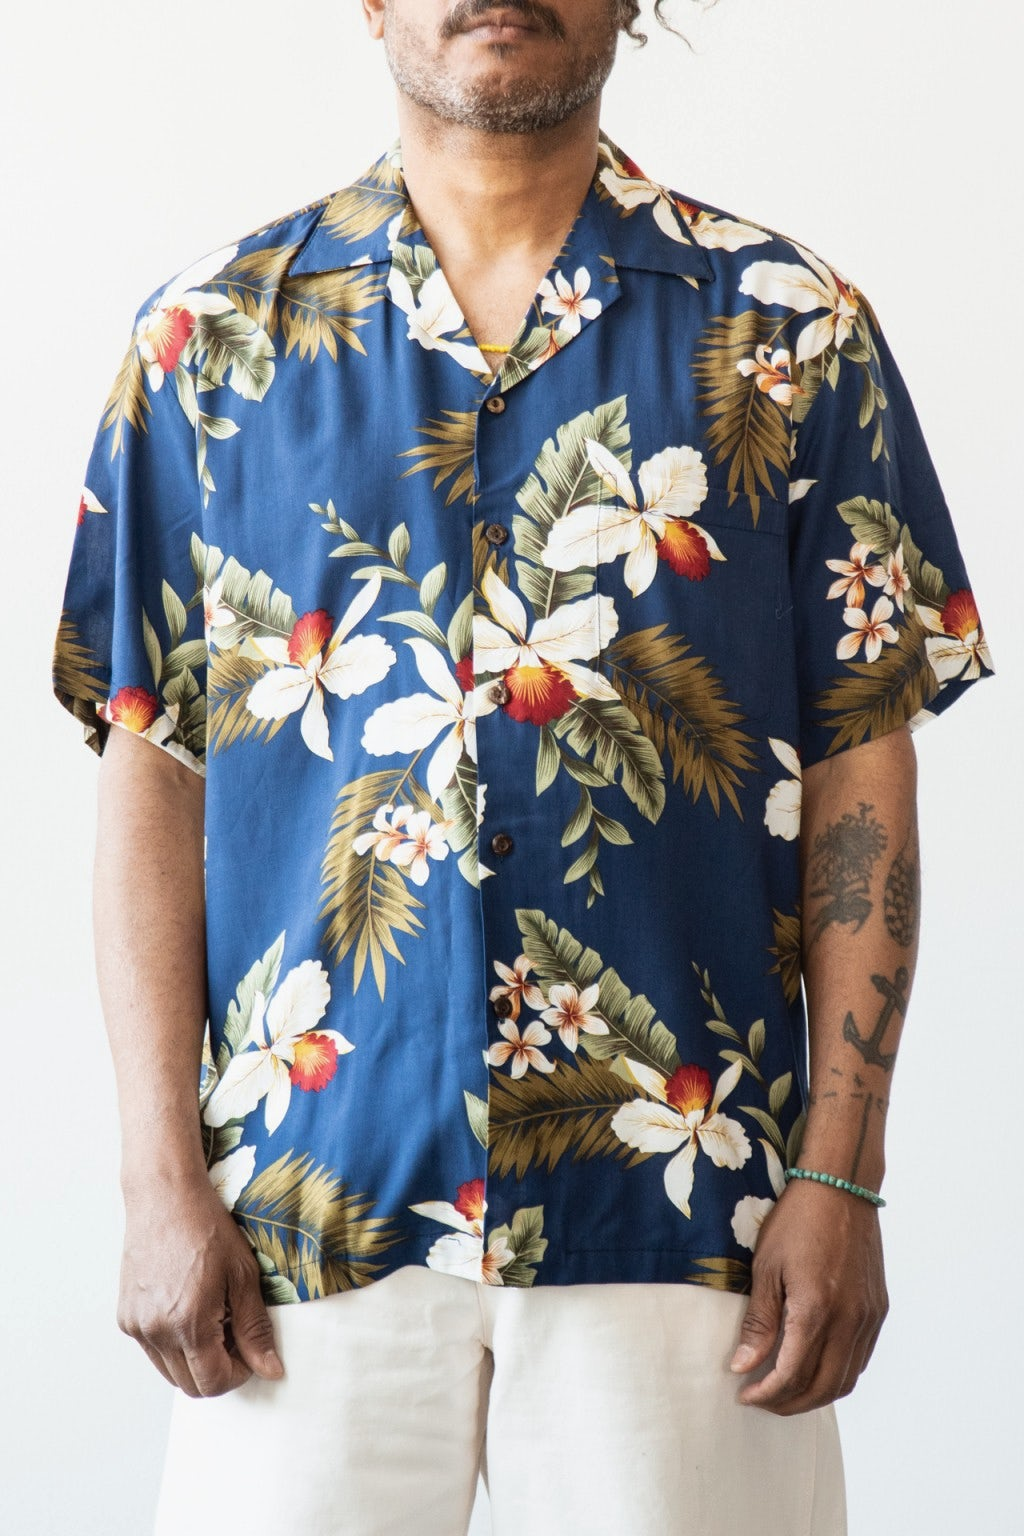 Two Palms Hawaiin Orchid Shirt Navy